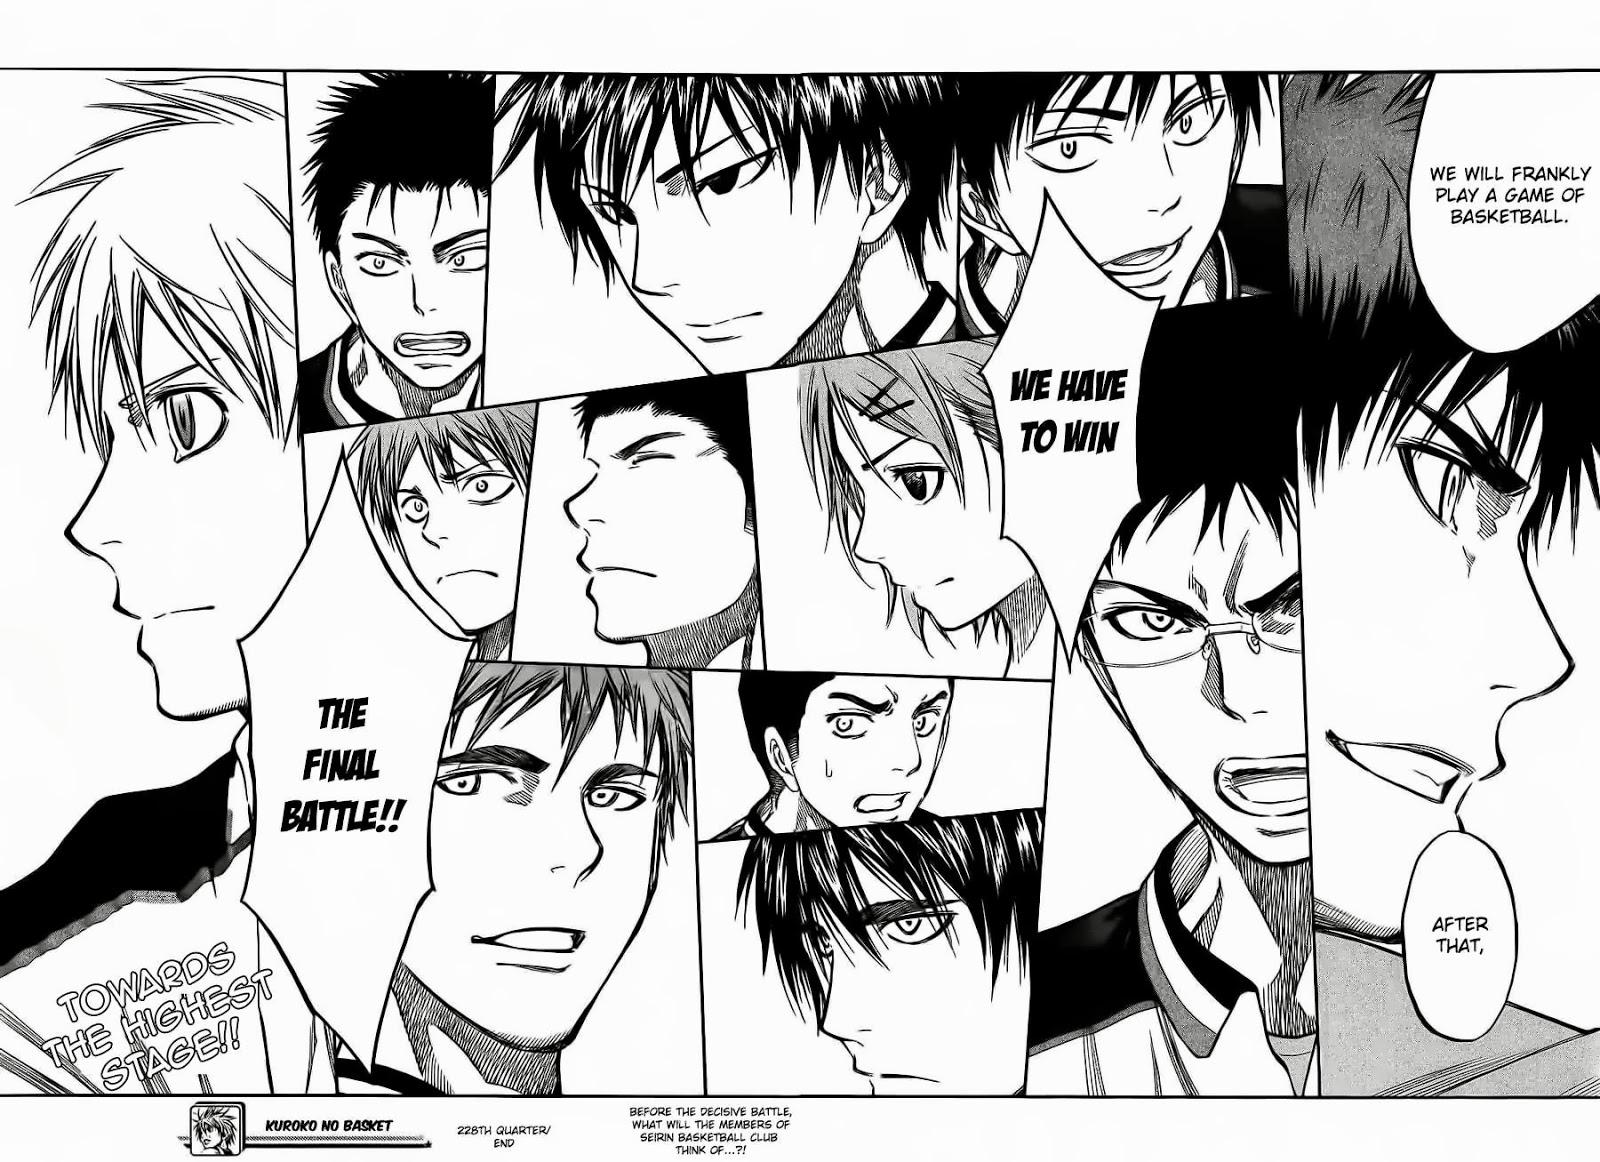 Kuroko no Basket Manga Chapter 228 - Image 18-19